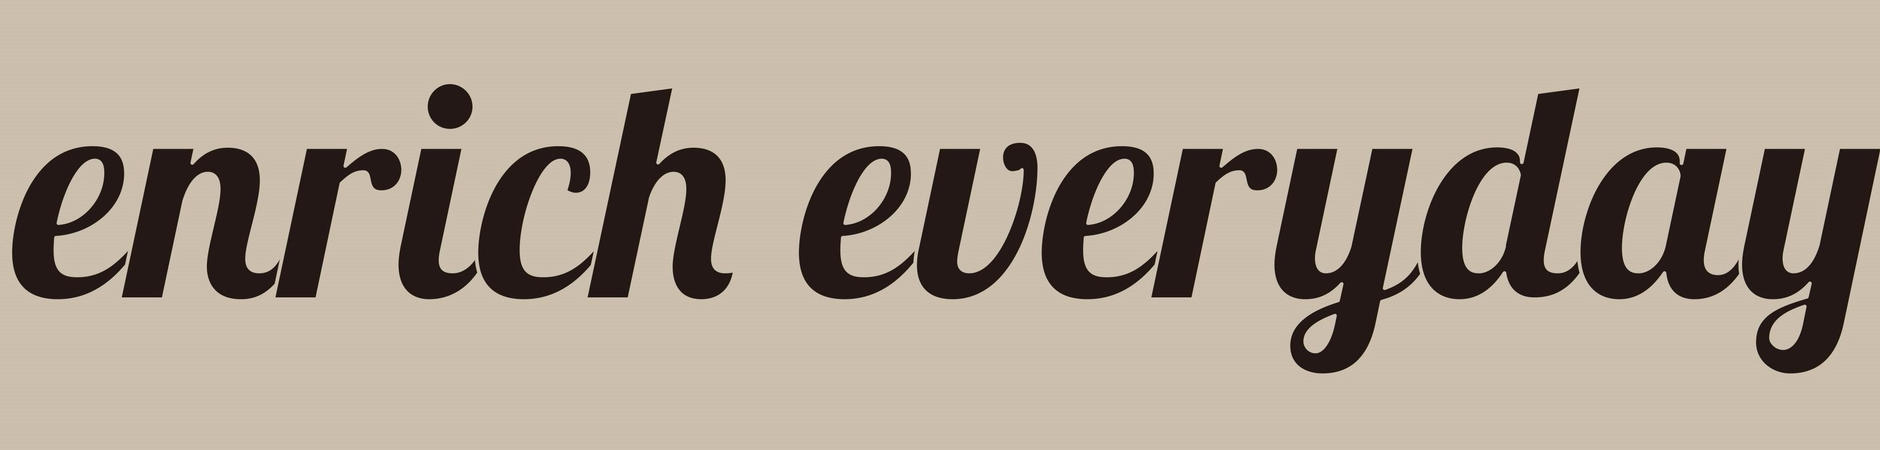 enrich everyday